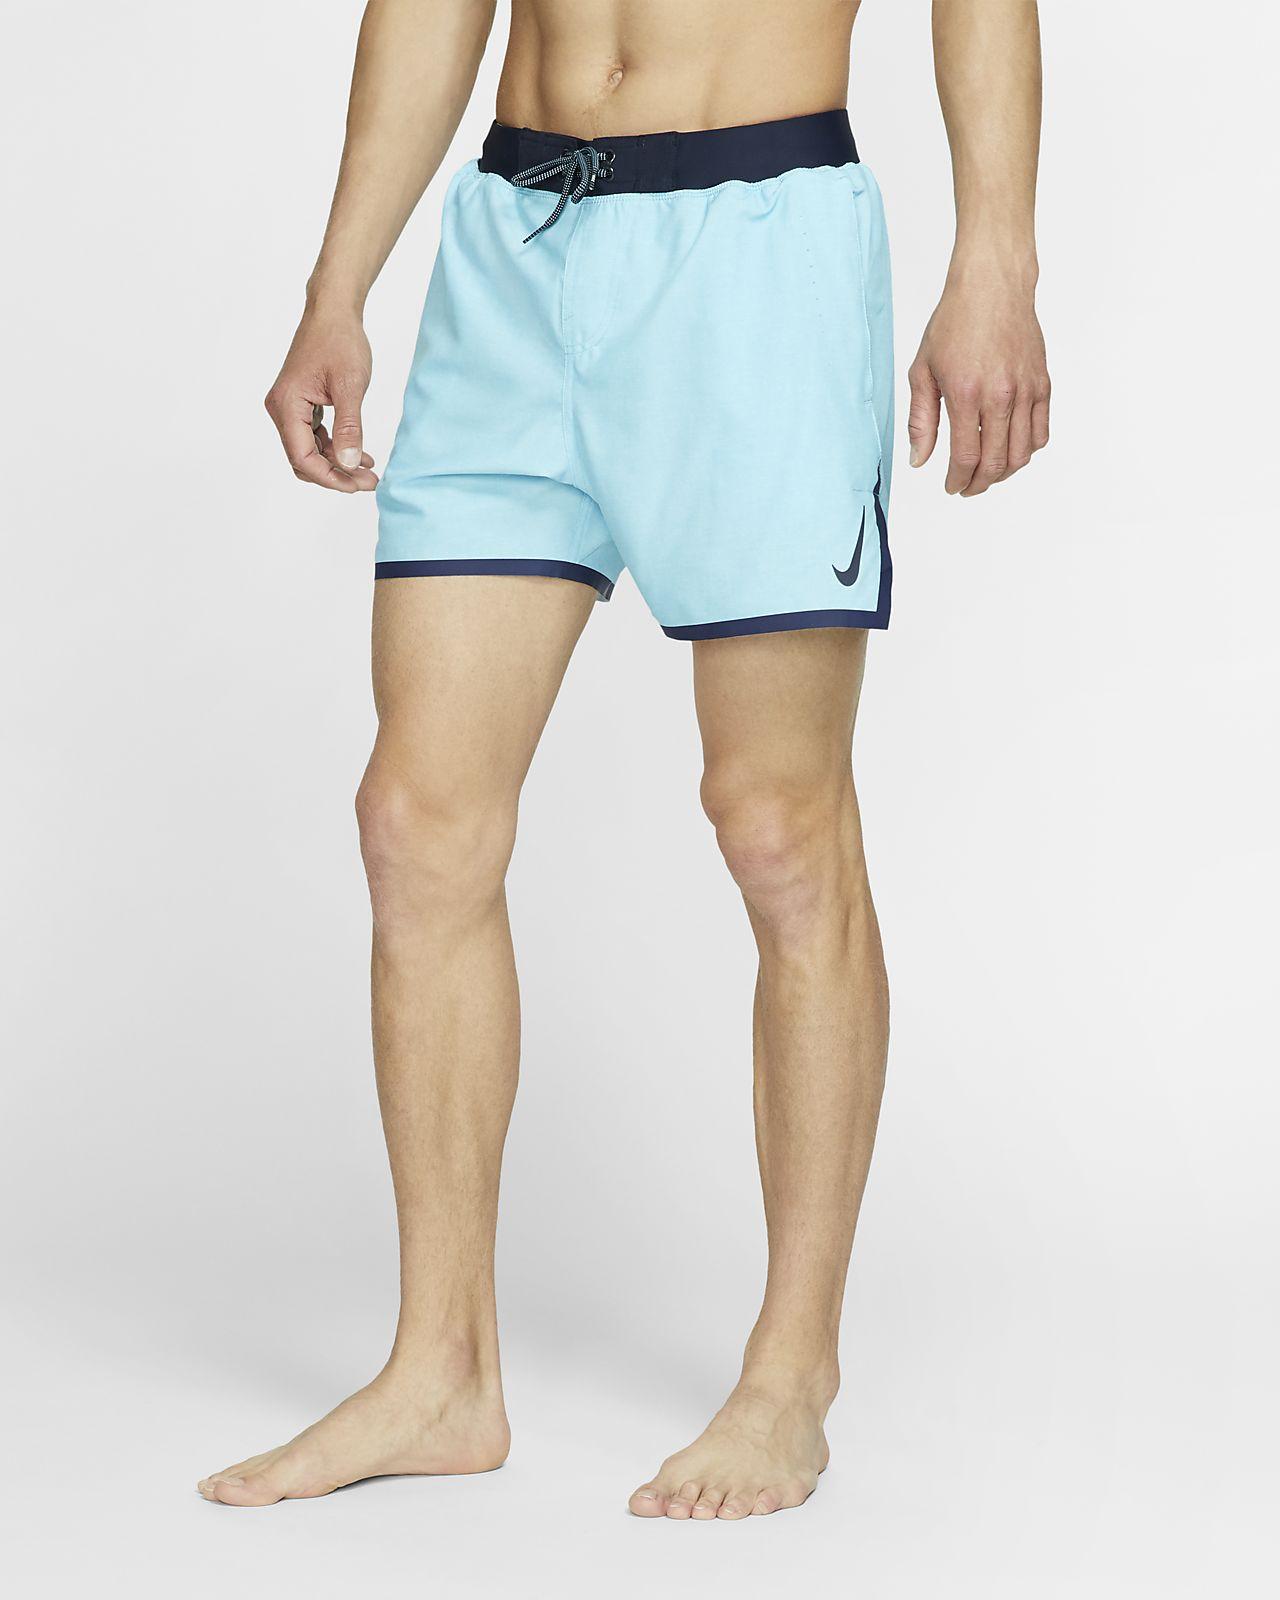 Nike Linen Blade Volley Pantalons curts de 13 cm - Home